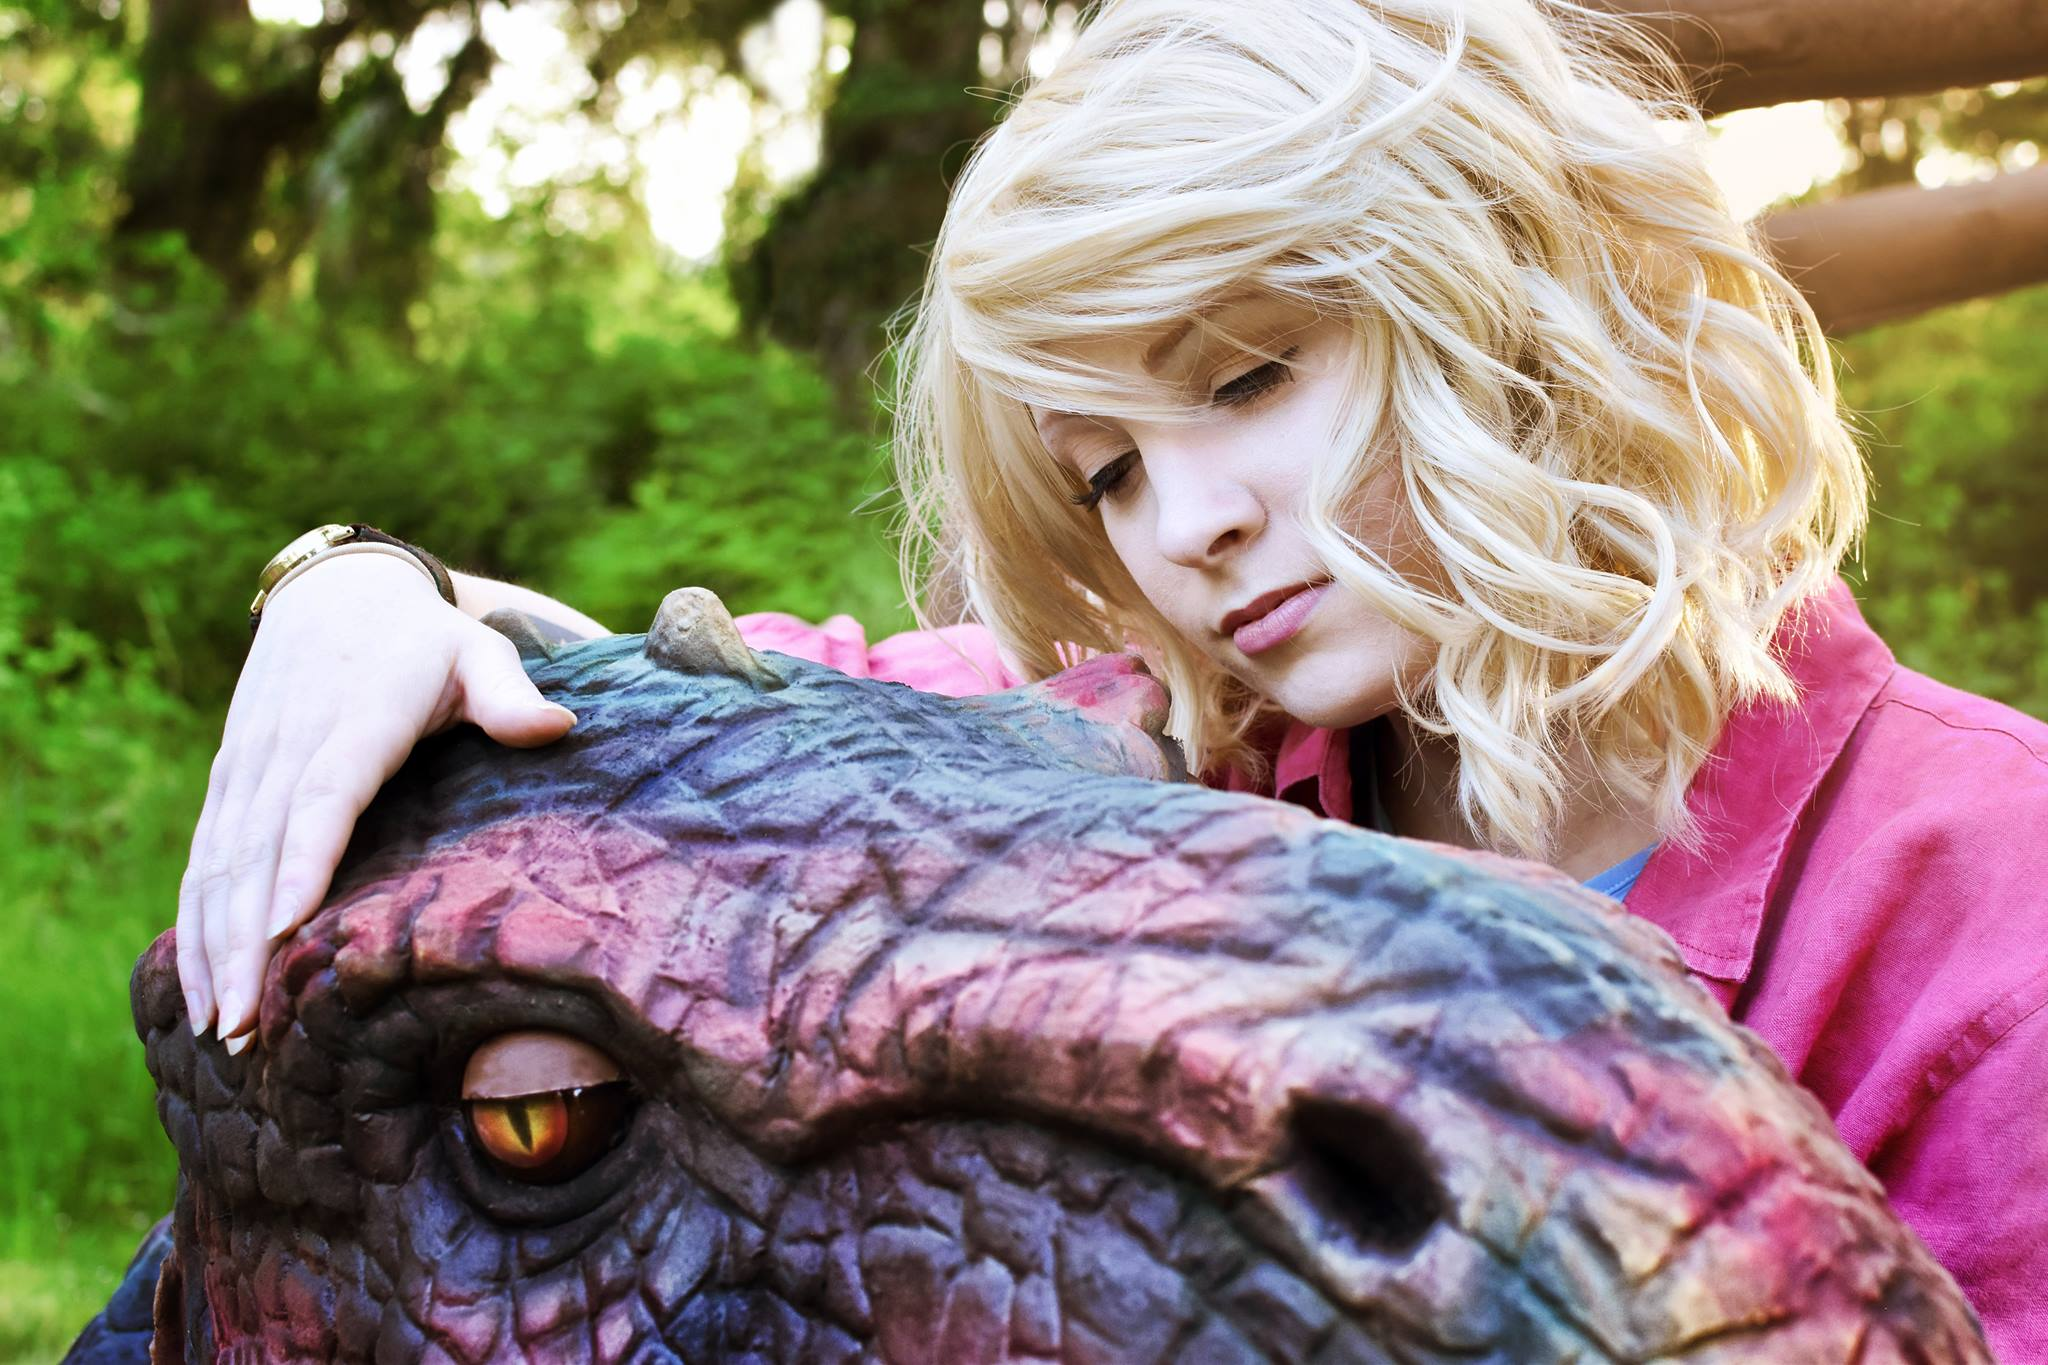 Ellie Jurassic Park Cosplay.jpg